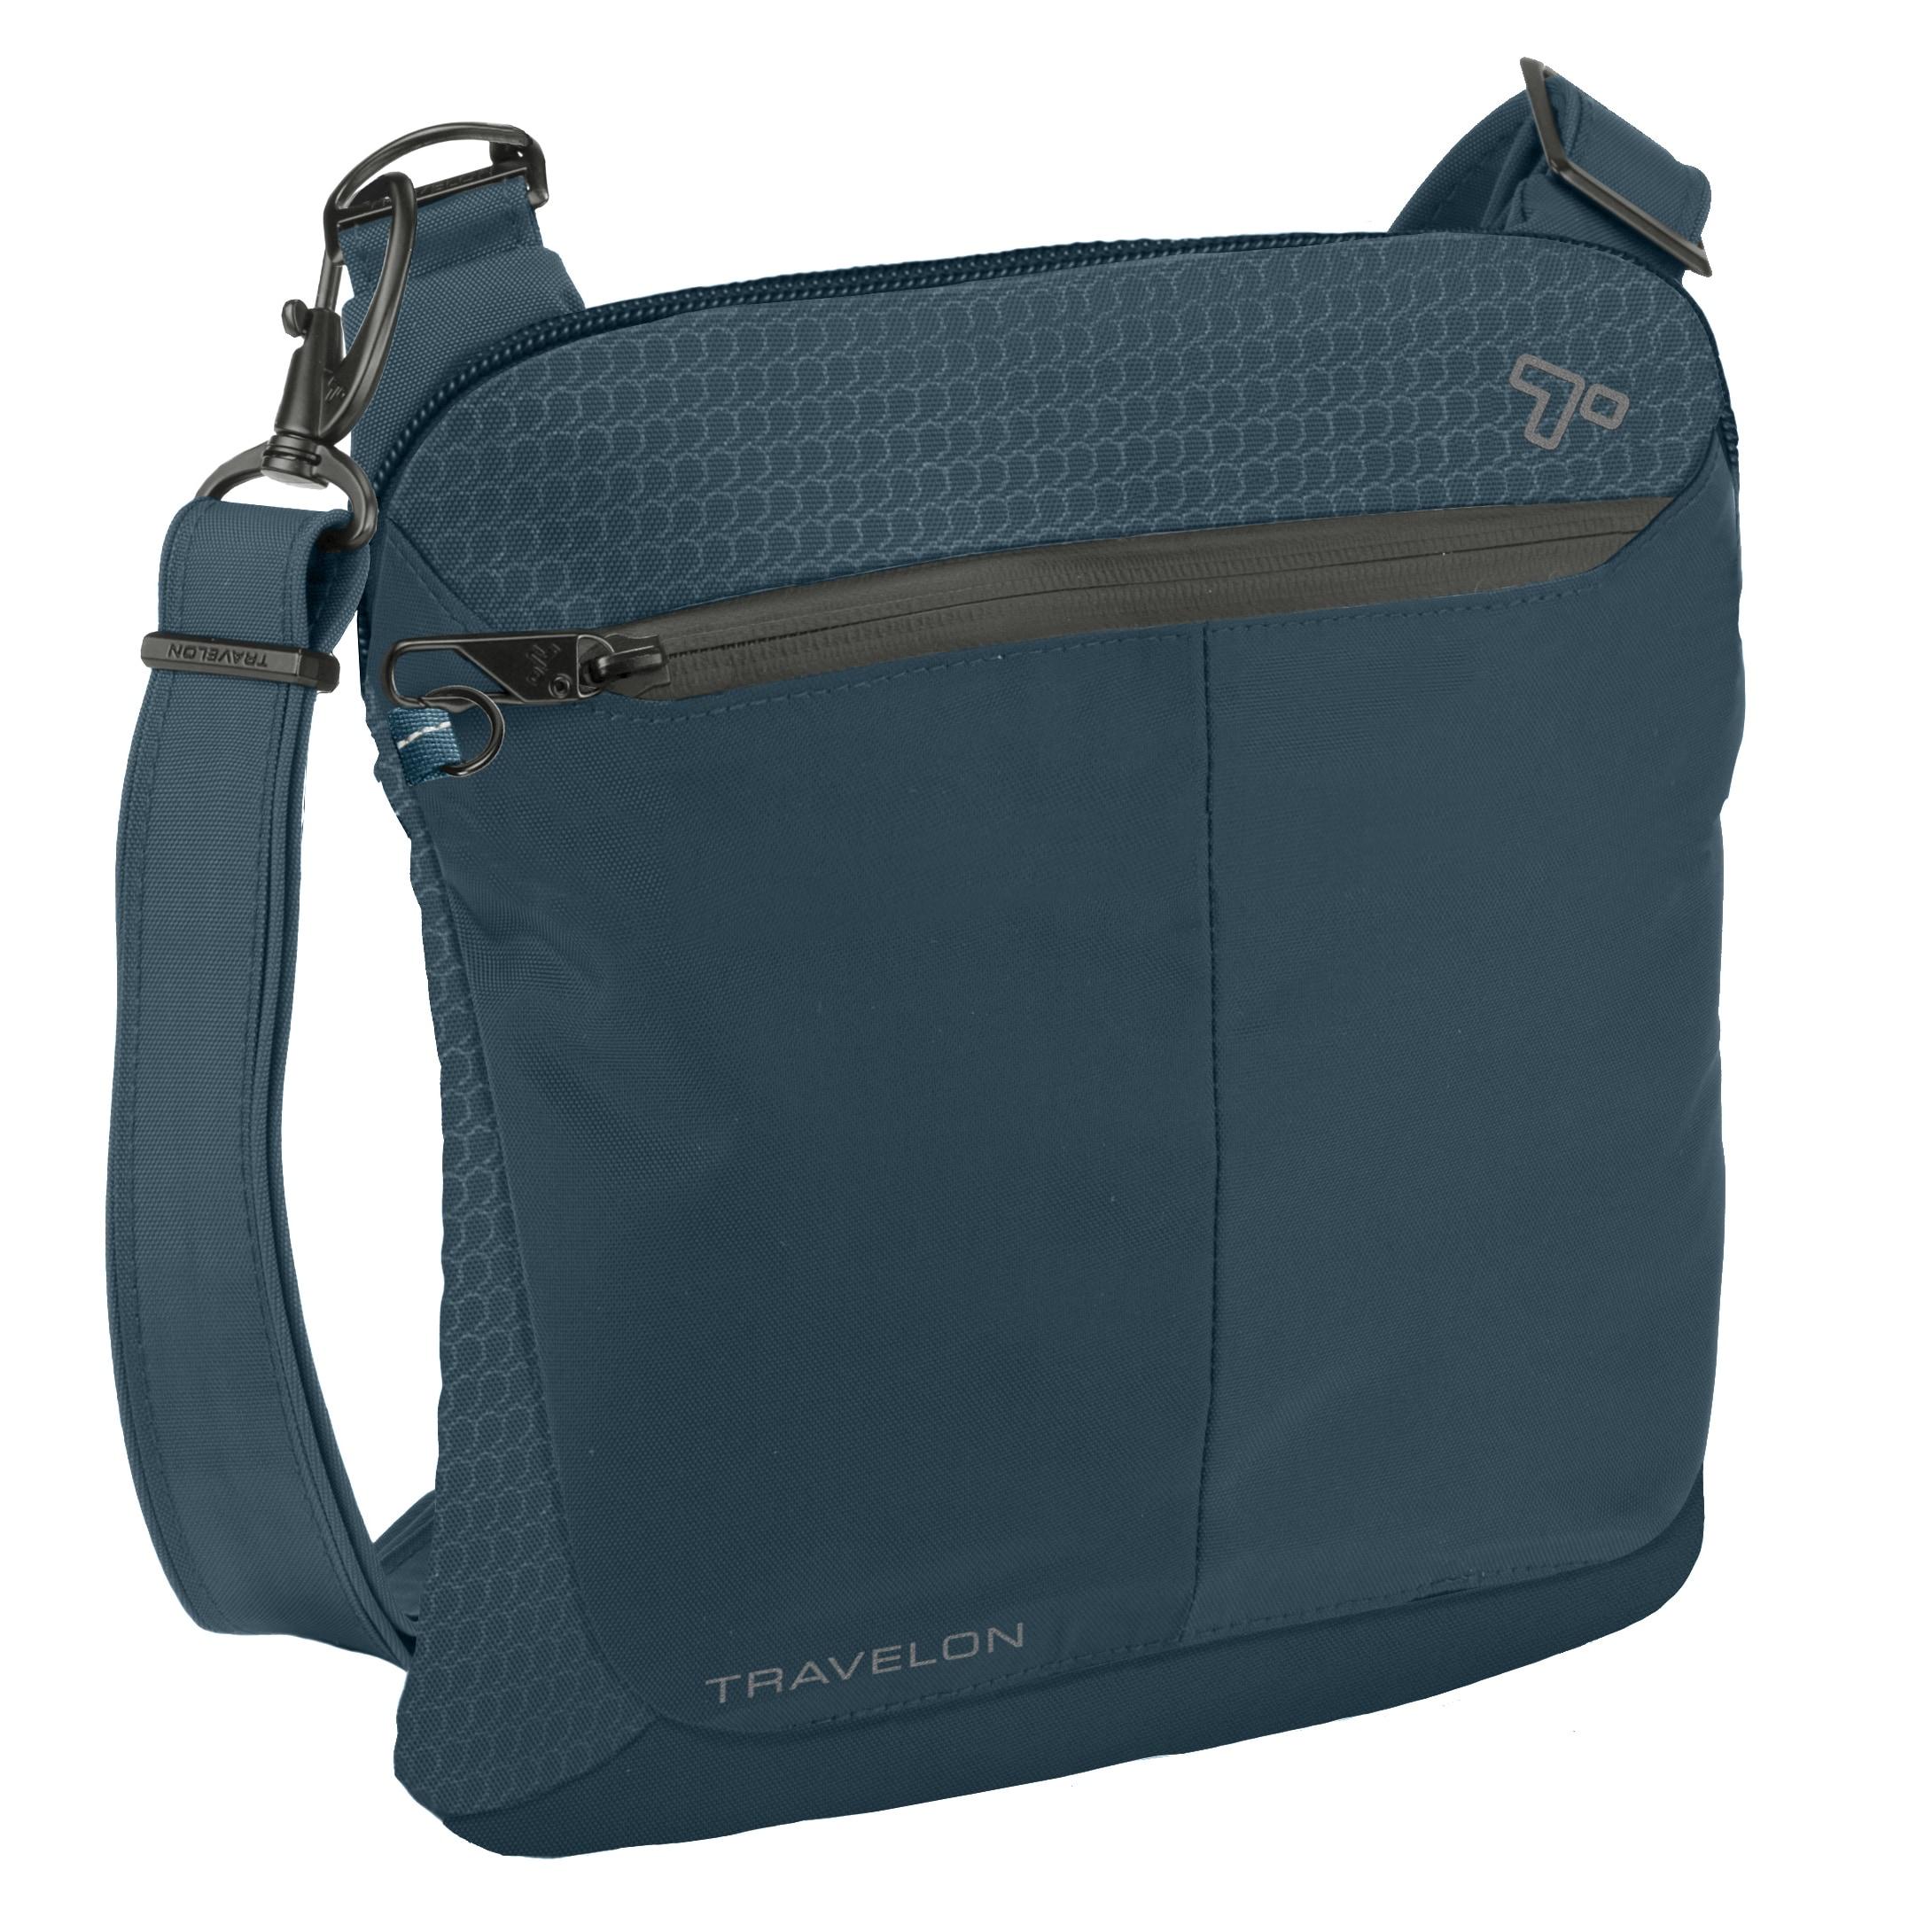 Travelon Anti Theft Active Small Crossbody Bag